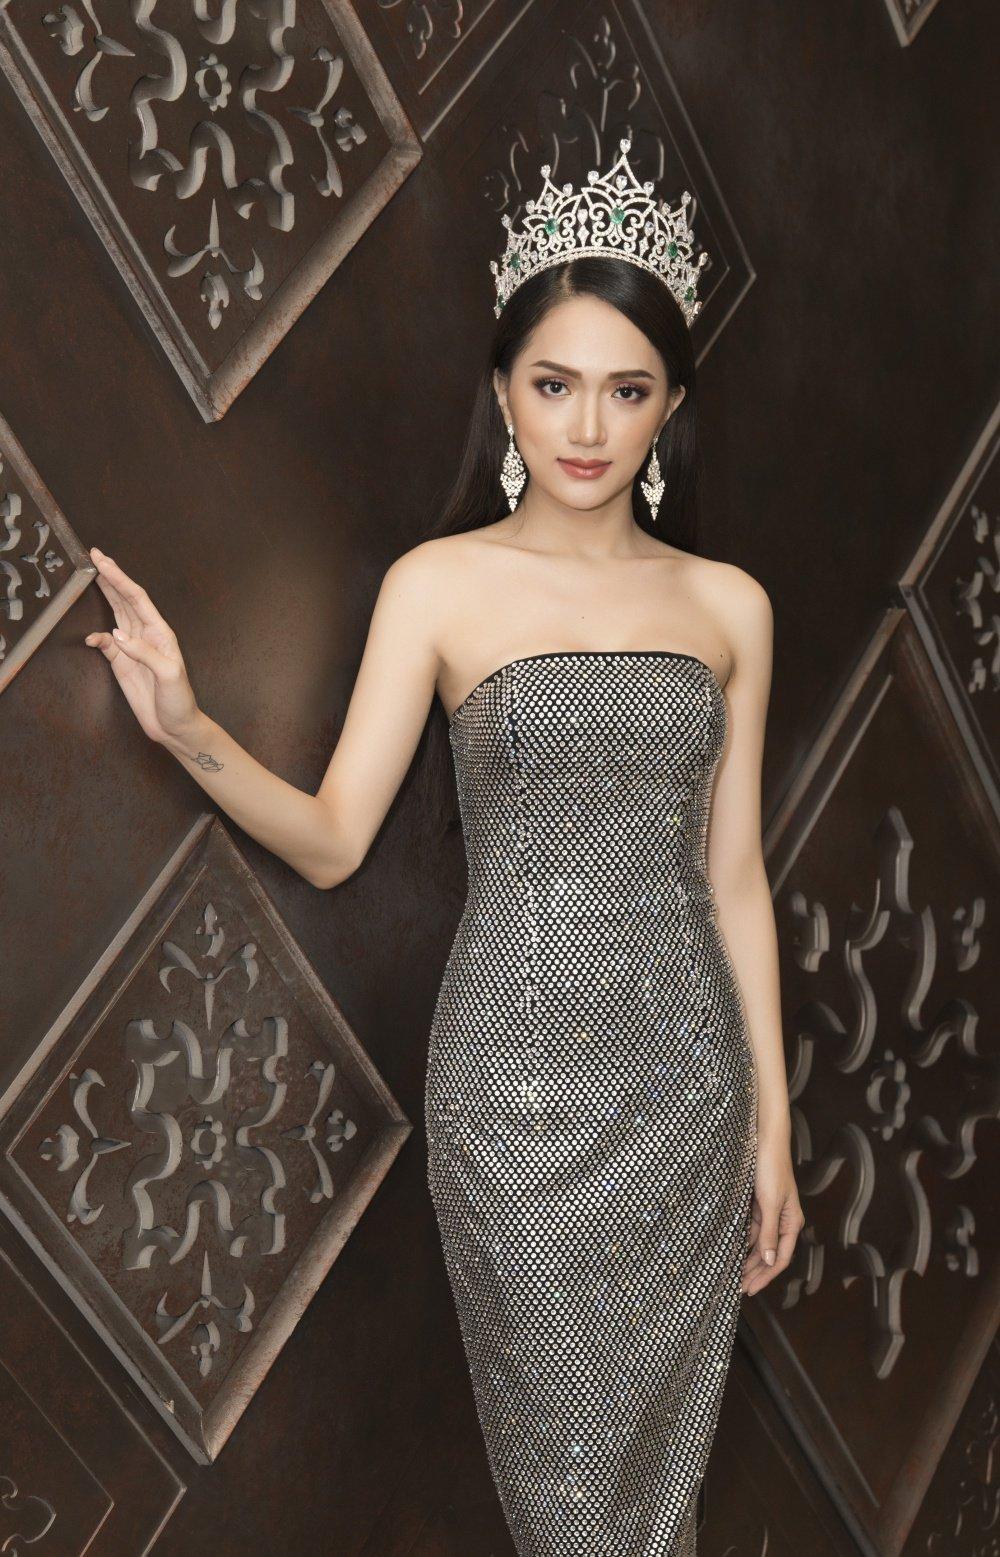 Hoa hau Huong Giang khoe nhan sac xinh dep o Thai Lan hinh anh 7